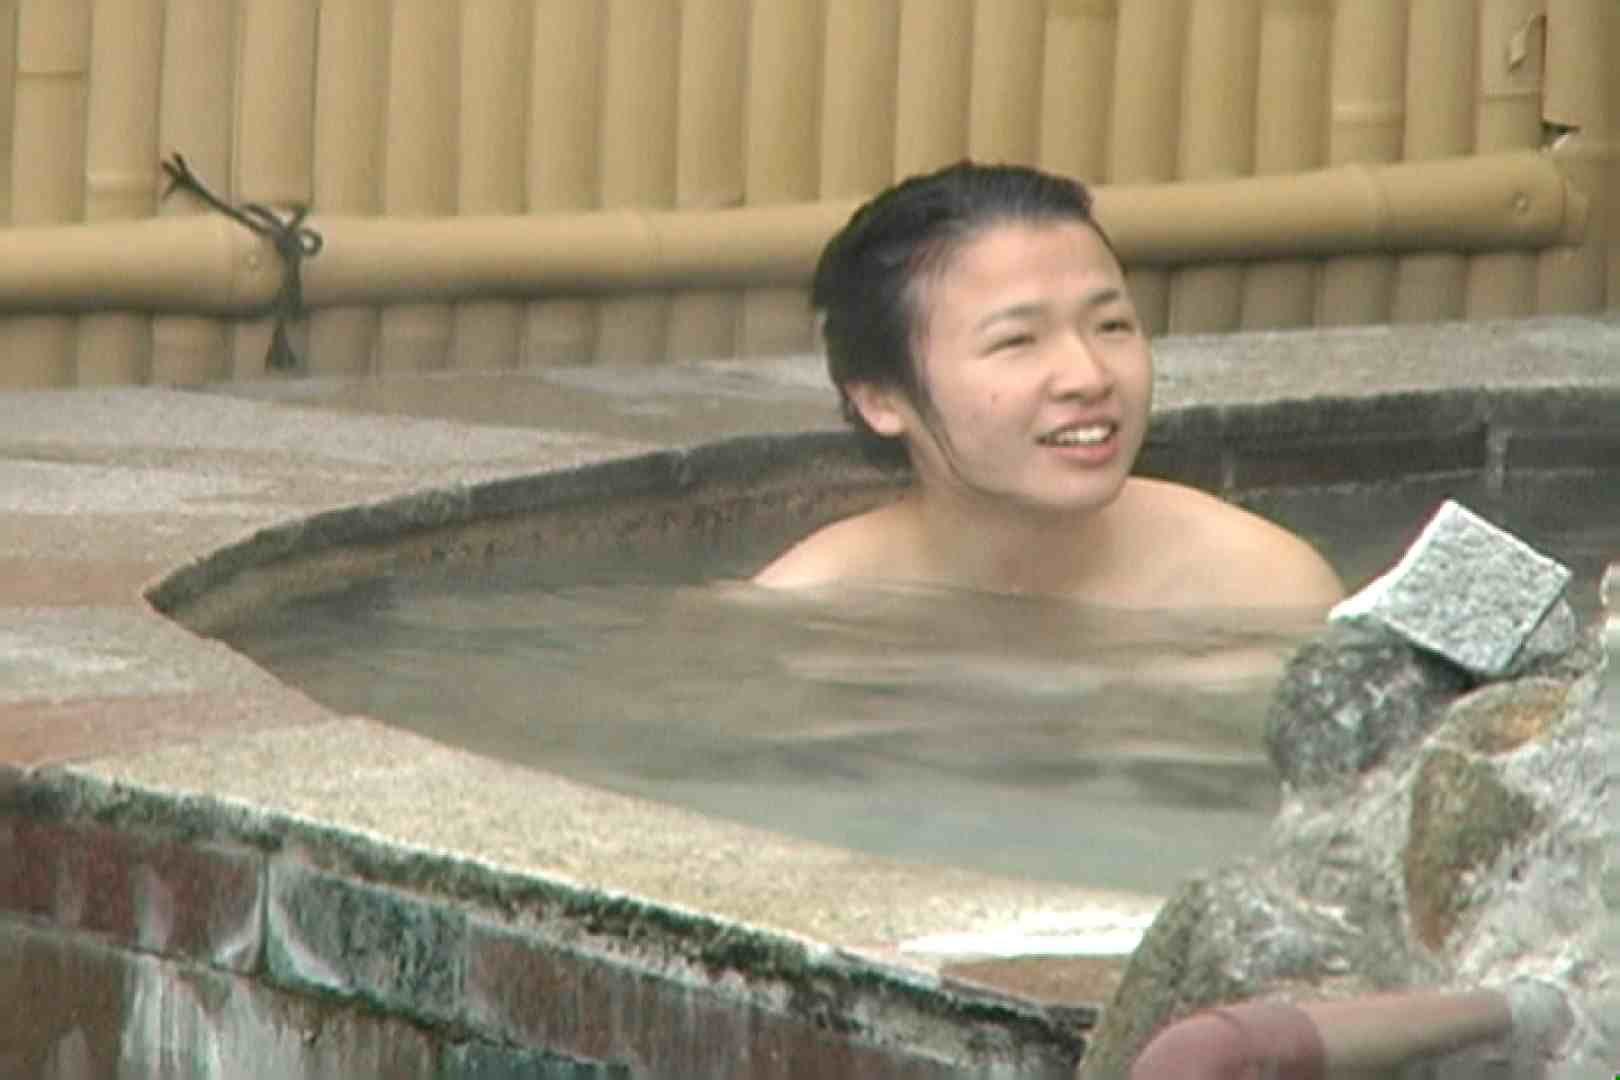 Aquaな露天風呂Vol.647 OLセックス 盗撮戯れ無修正画像 83画像 5